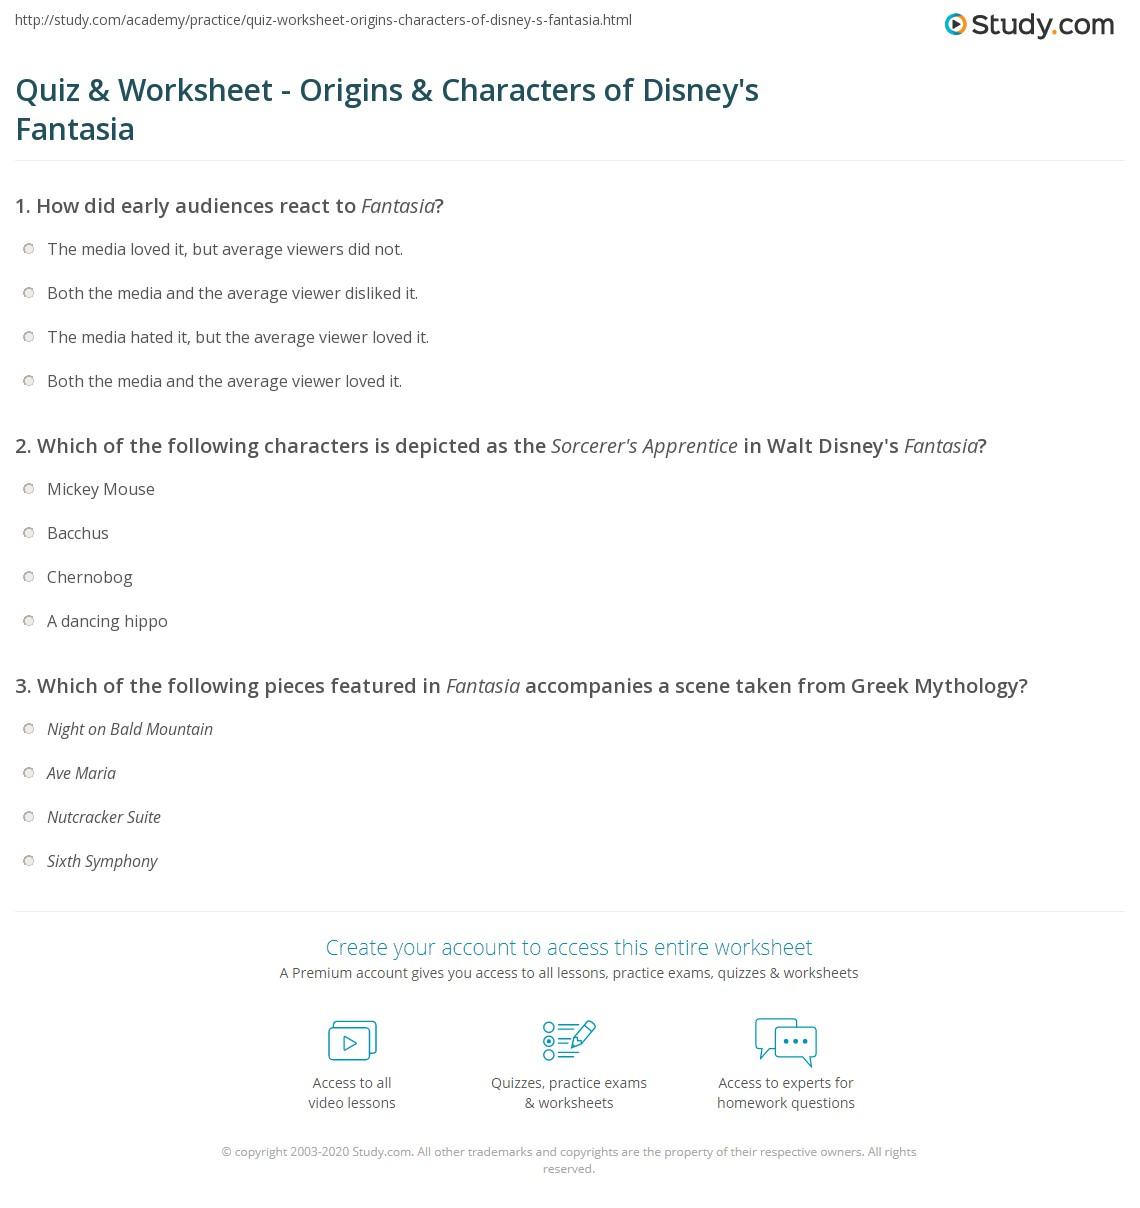 Worksheets Dads Worksheet disney worksheets super teacher print s fantasia 1940 history characters worksheet